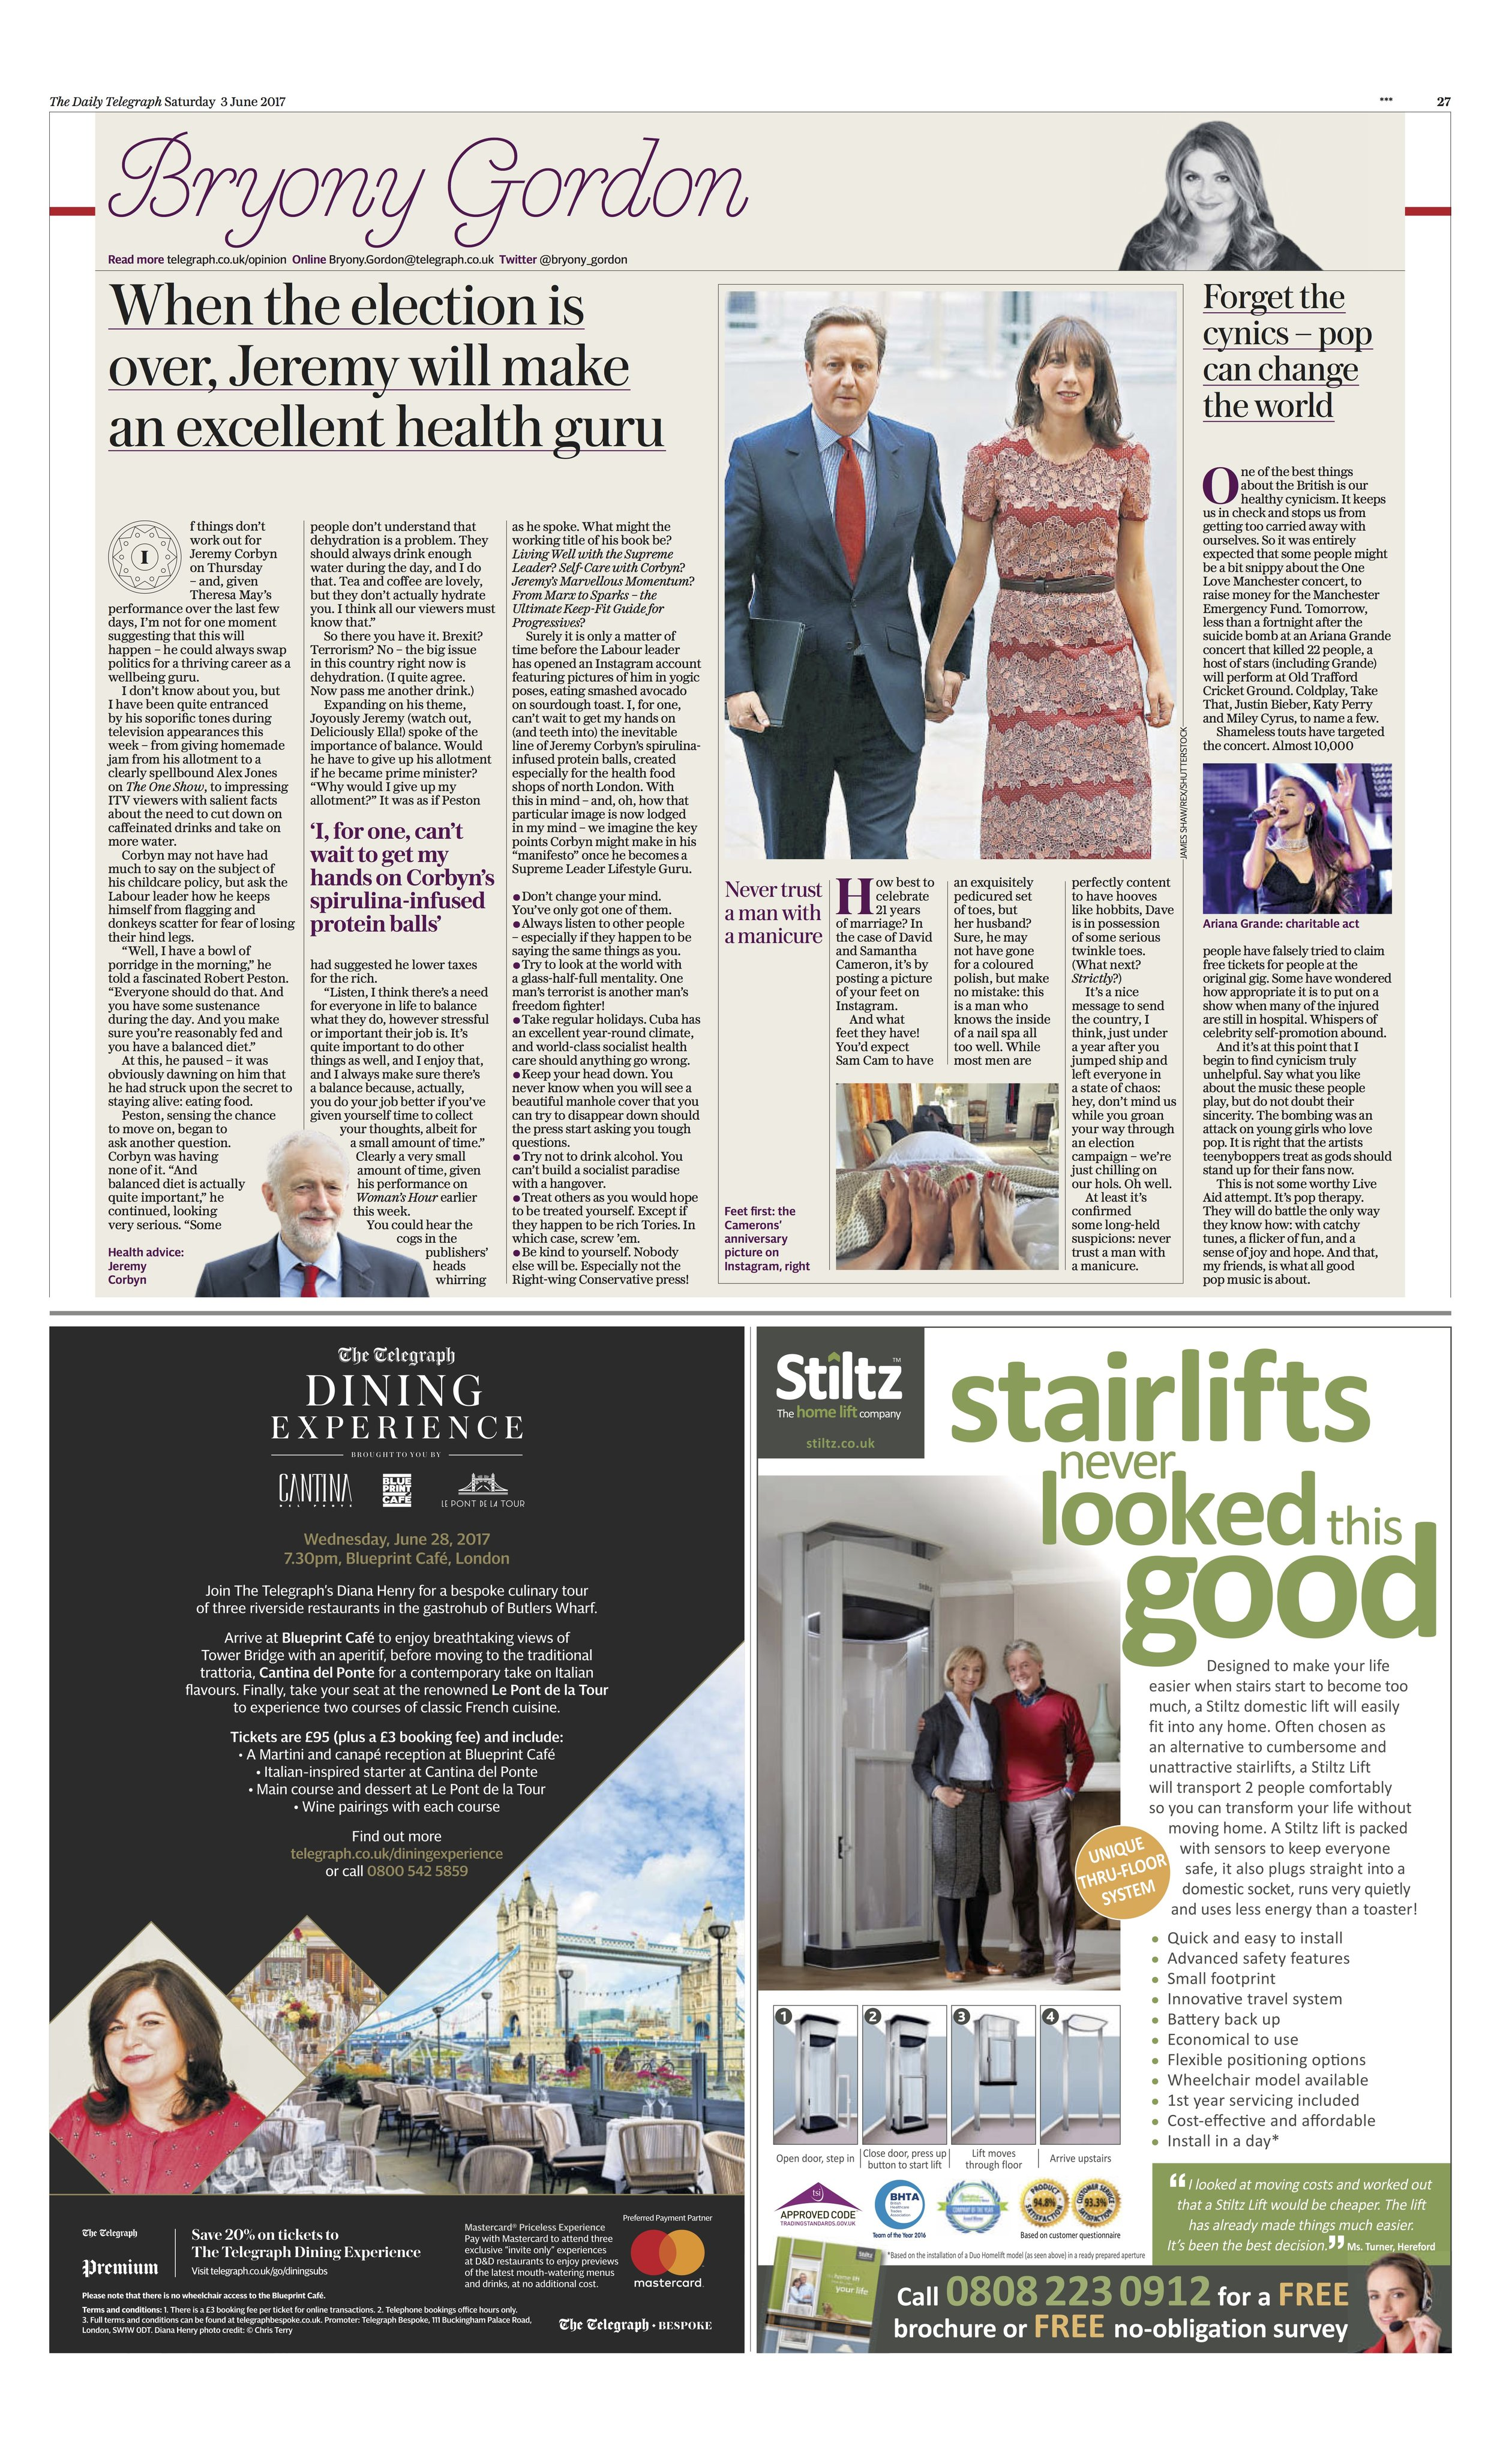 David Cameron / The Daily Telegraph